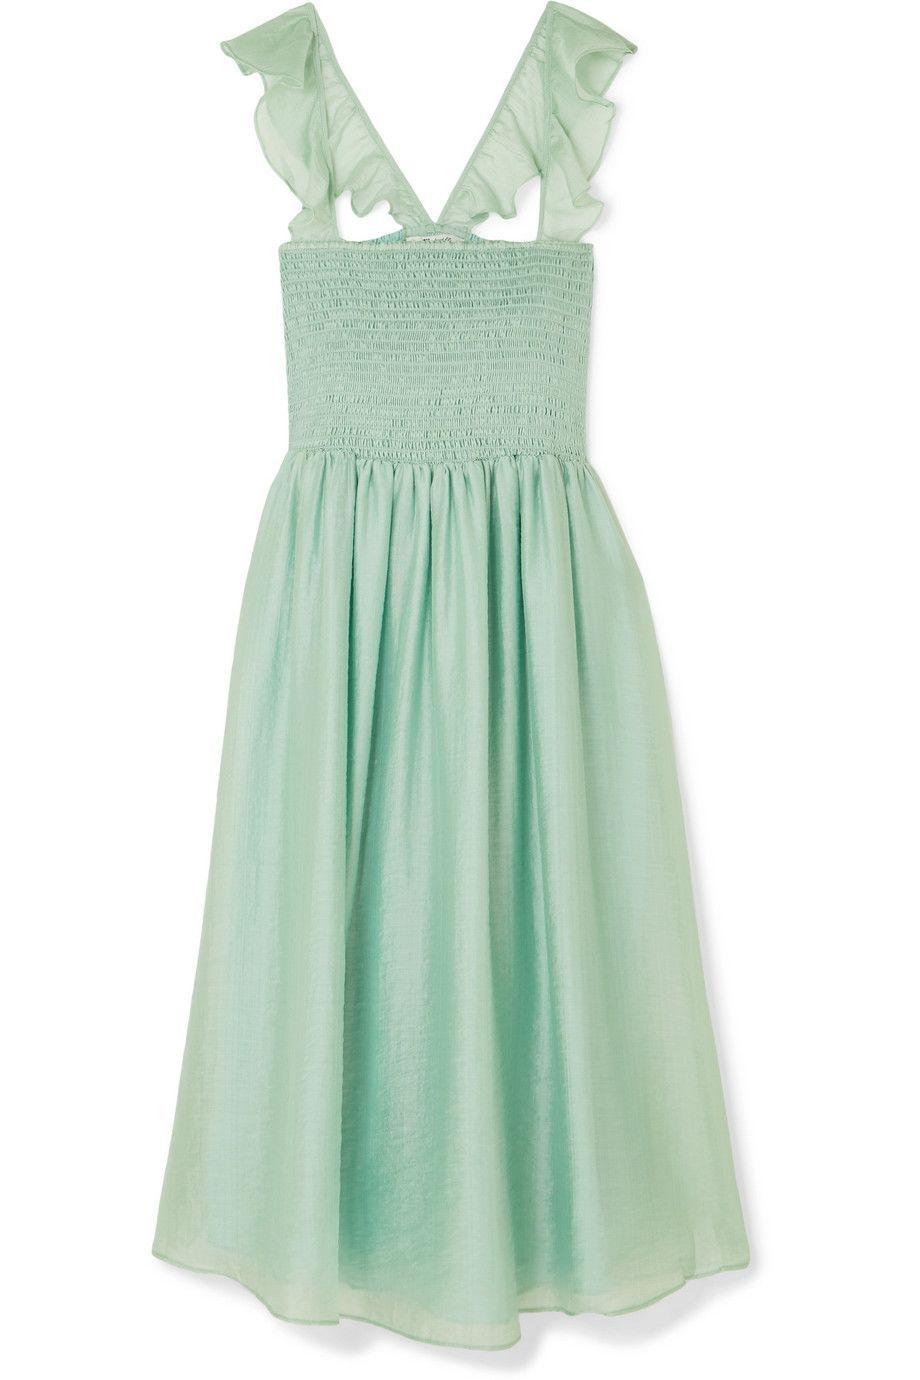 #PopbelaOOTD: Dress Manis Berwarna Permen